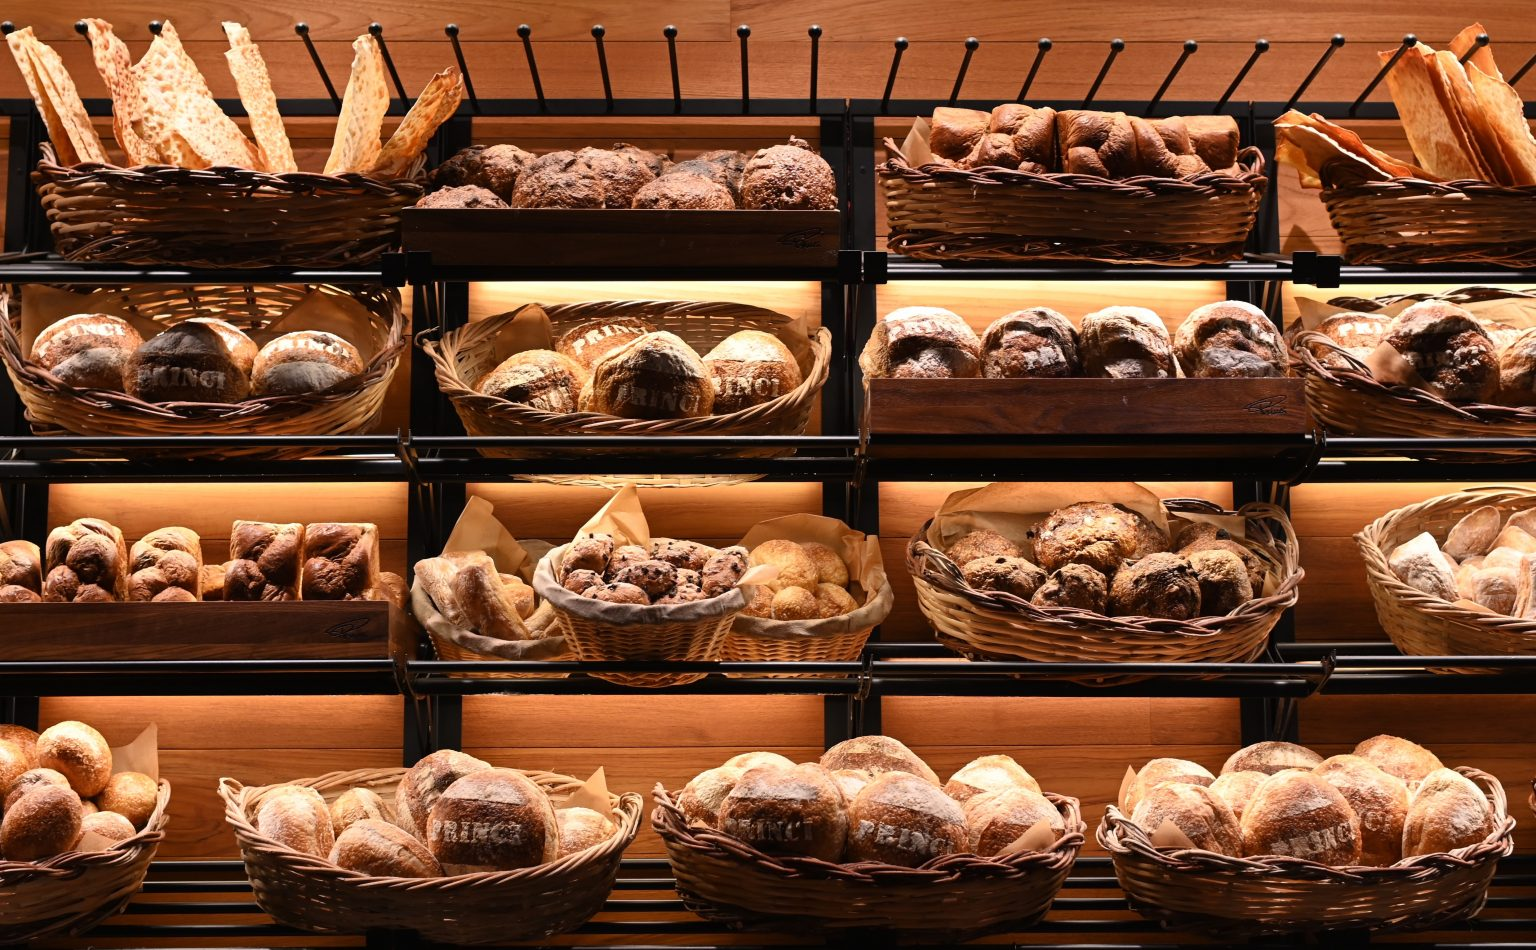 bakery in Kuala Lumpur city and Klang Valley